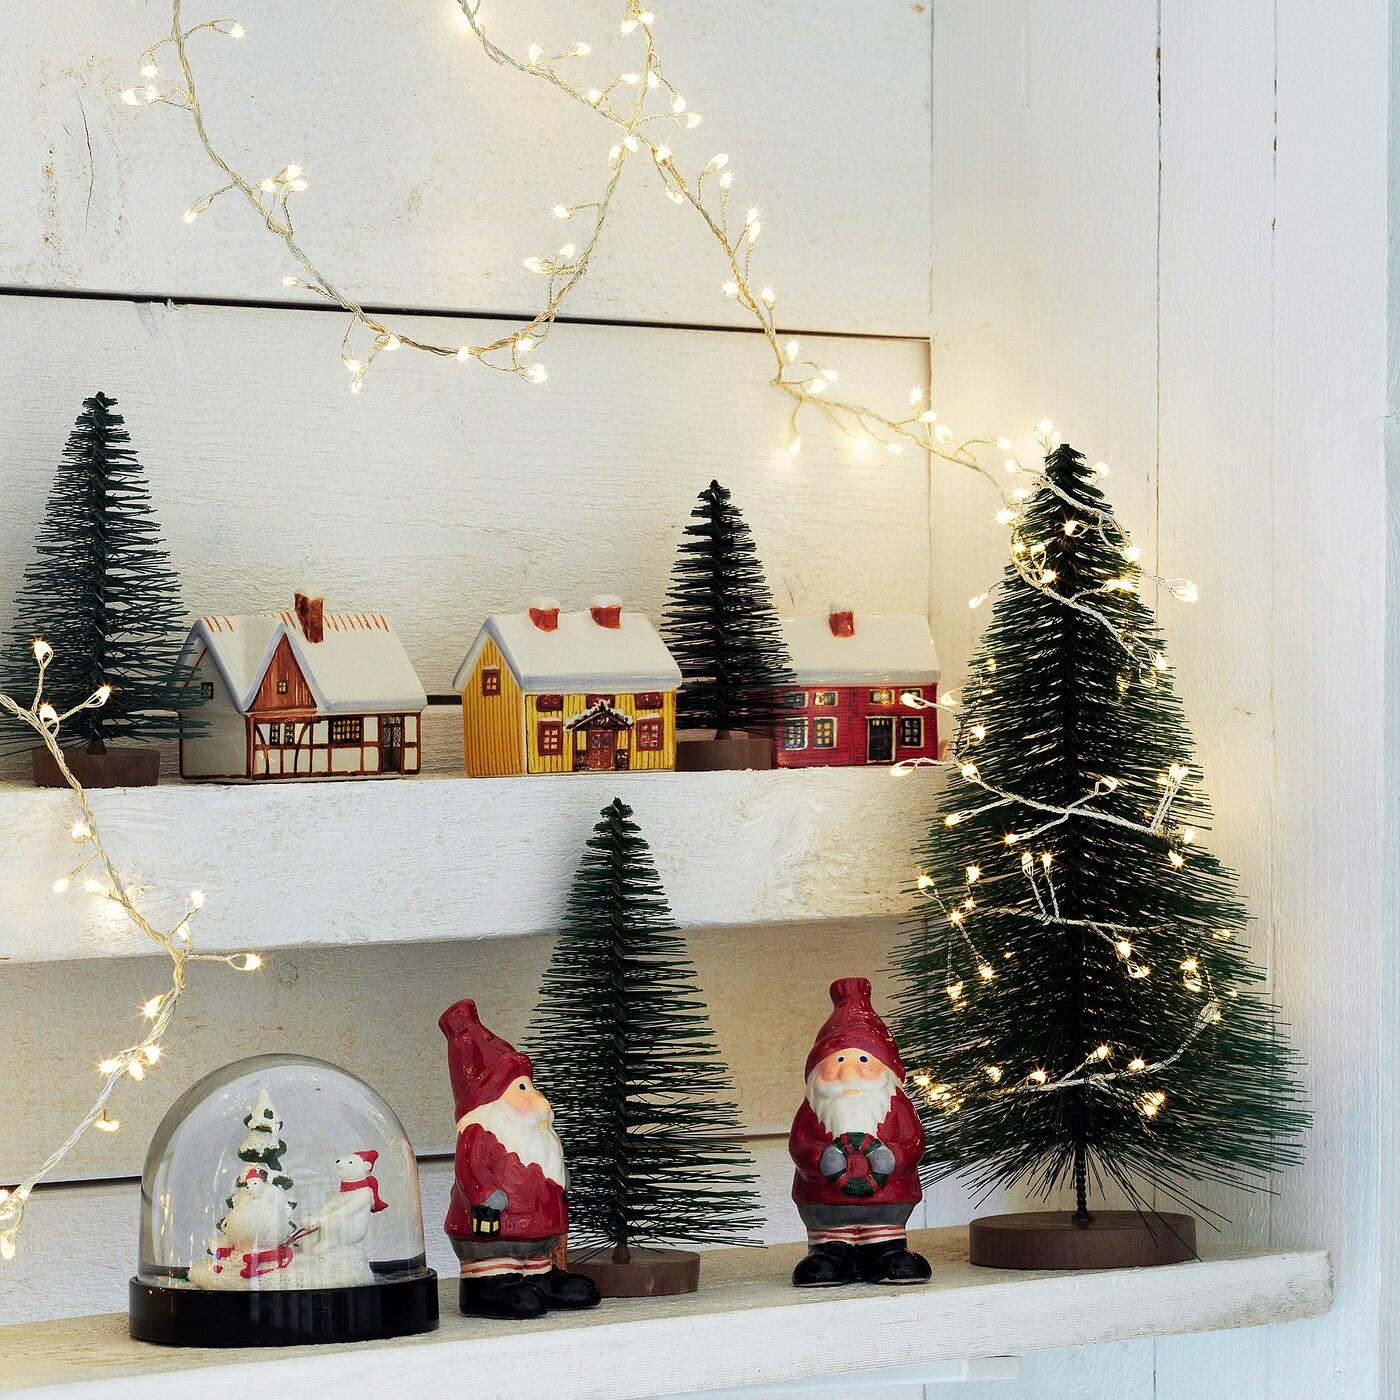 Vinter 2020 Decoration Christmas Tree Green 25 Cm Ikea Ireland